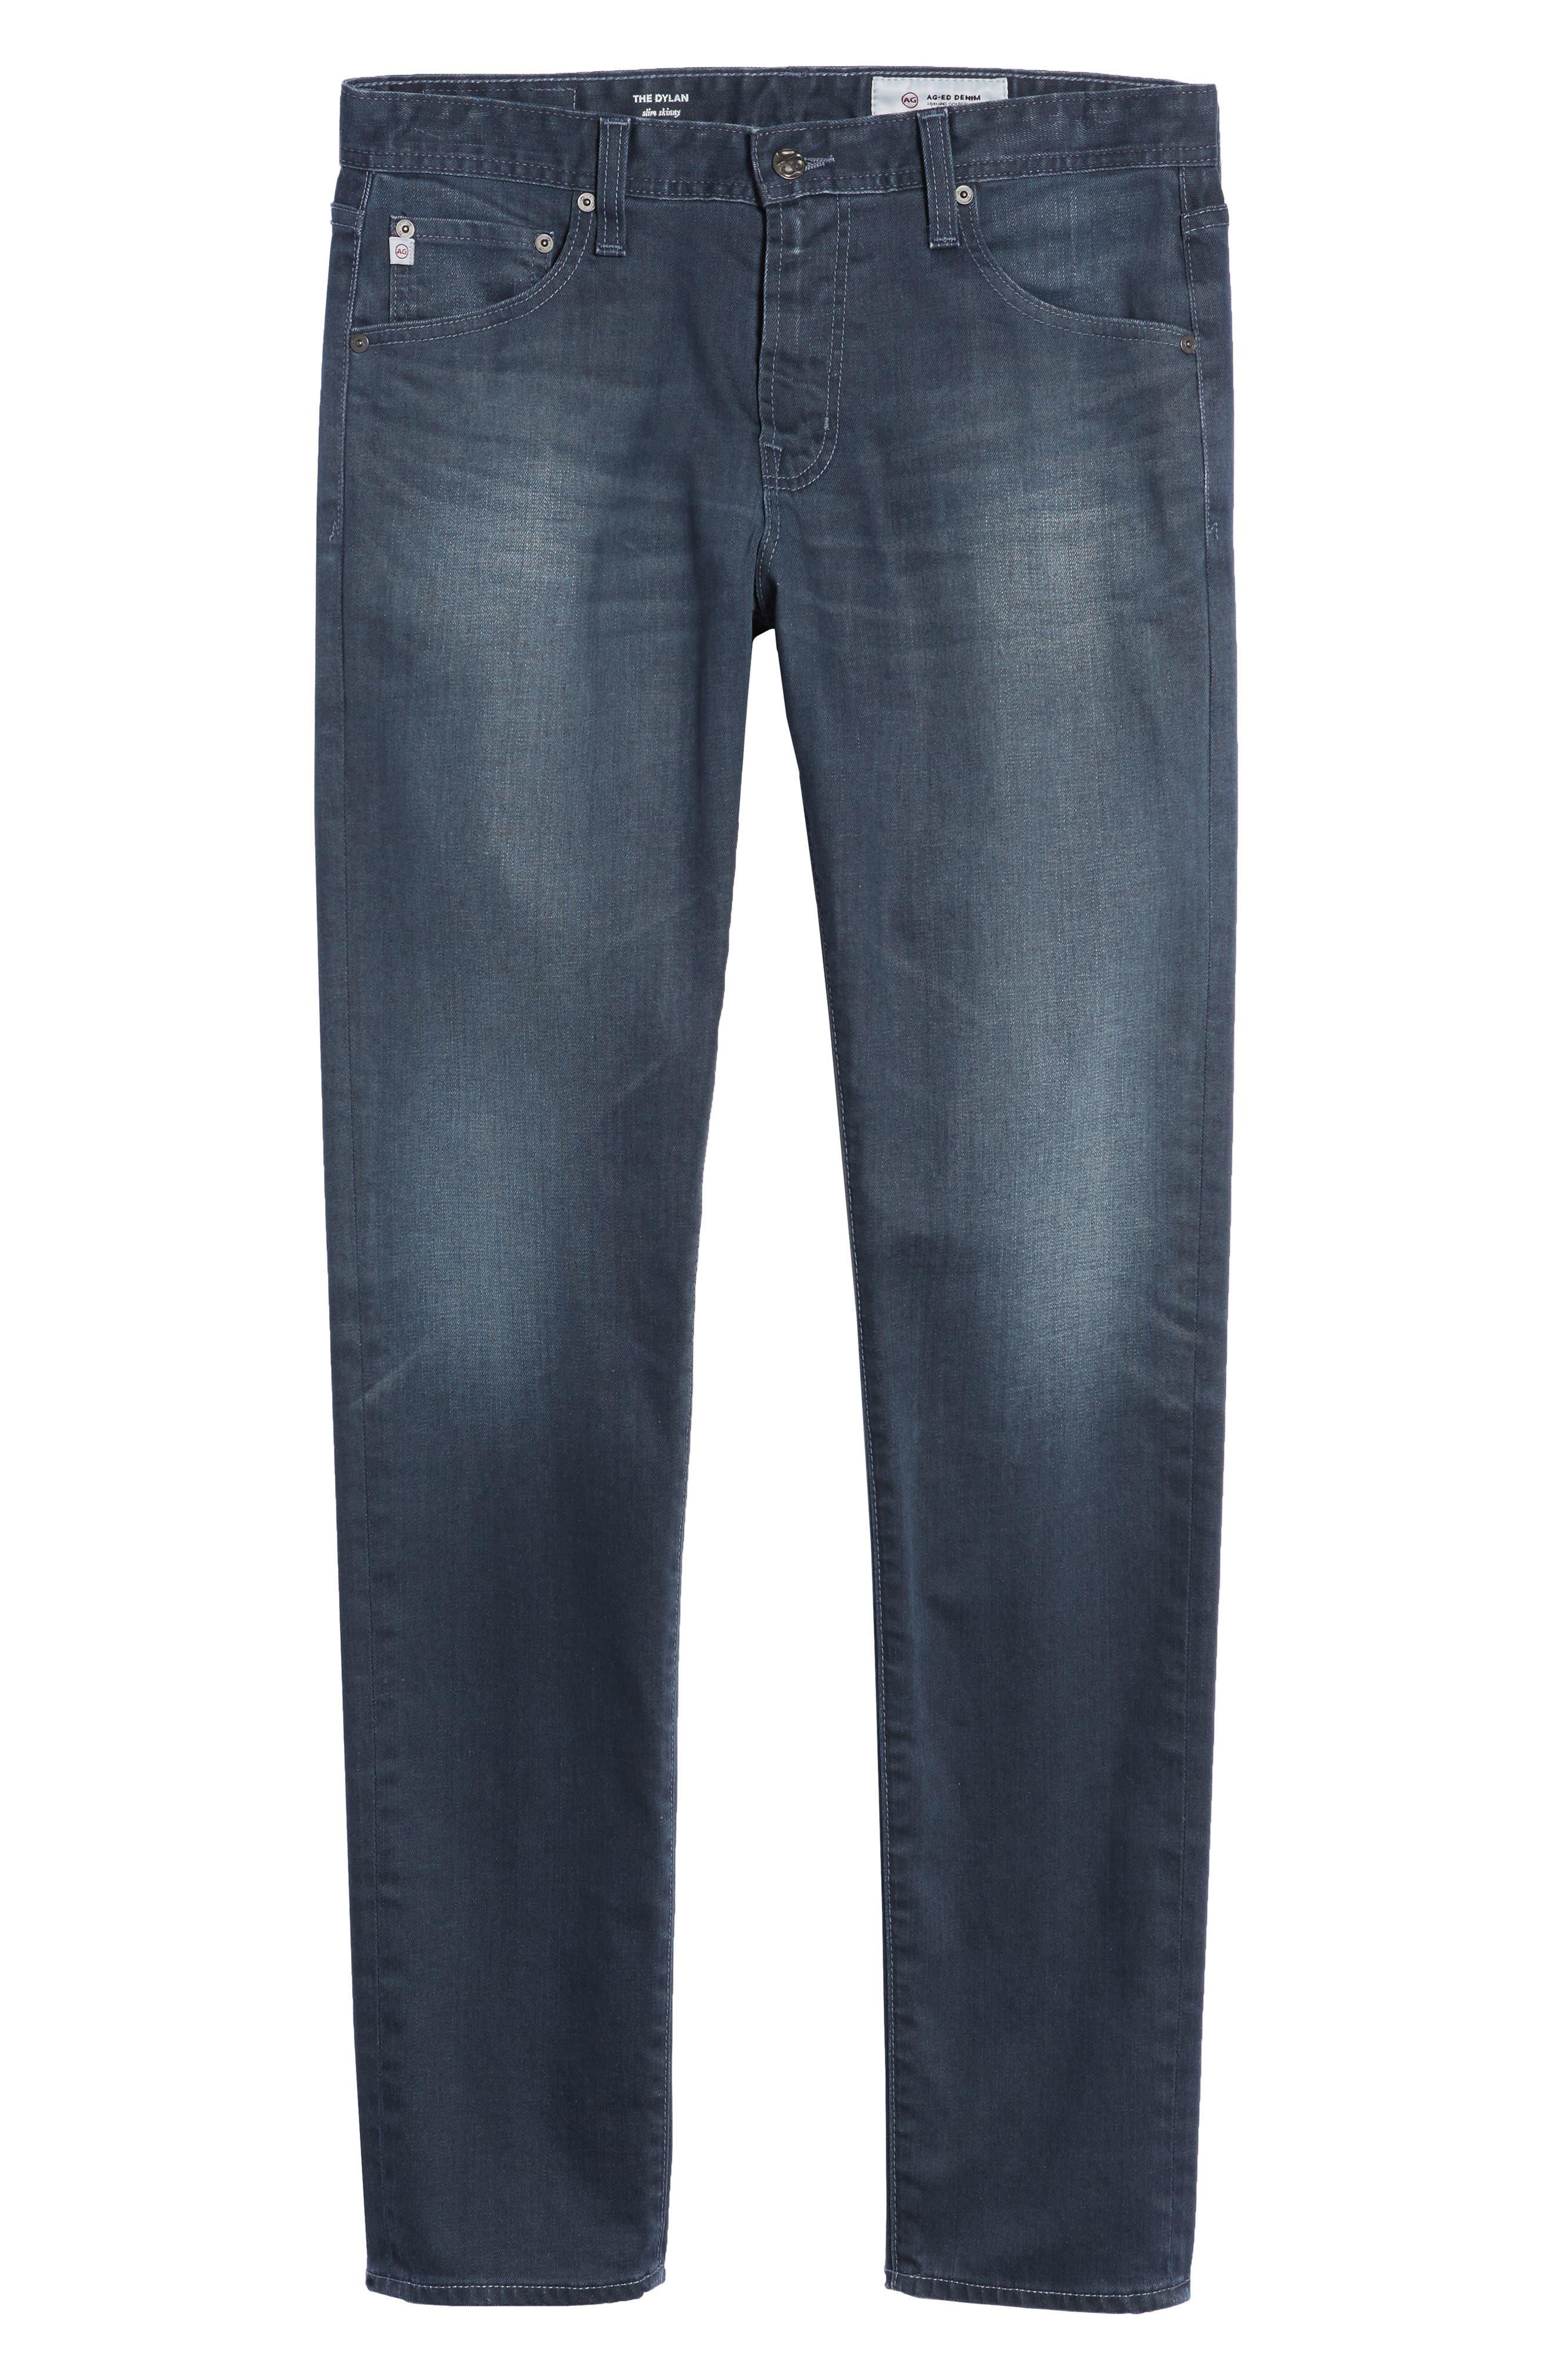 Dylan Skinny Fit Jeans,                             Alternate thumbnail 6, color,